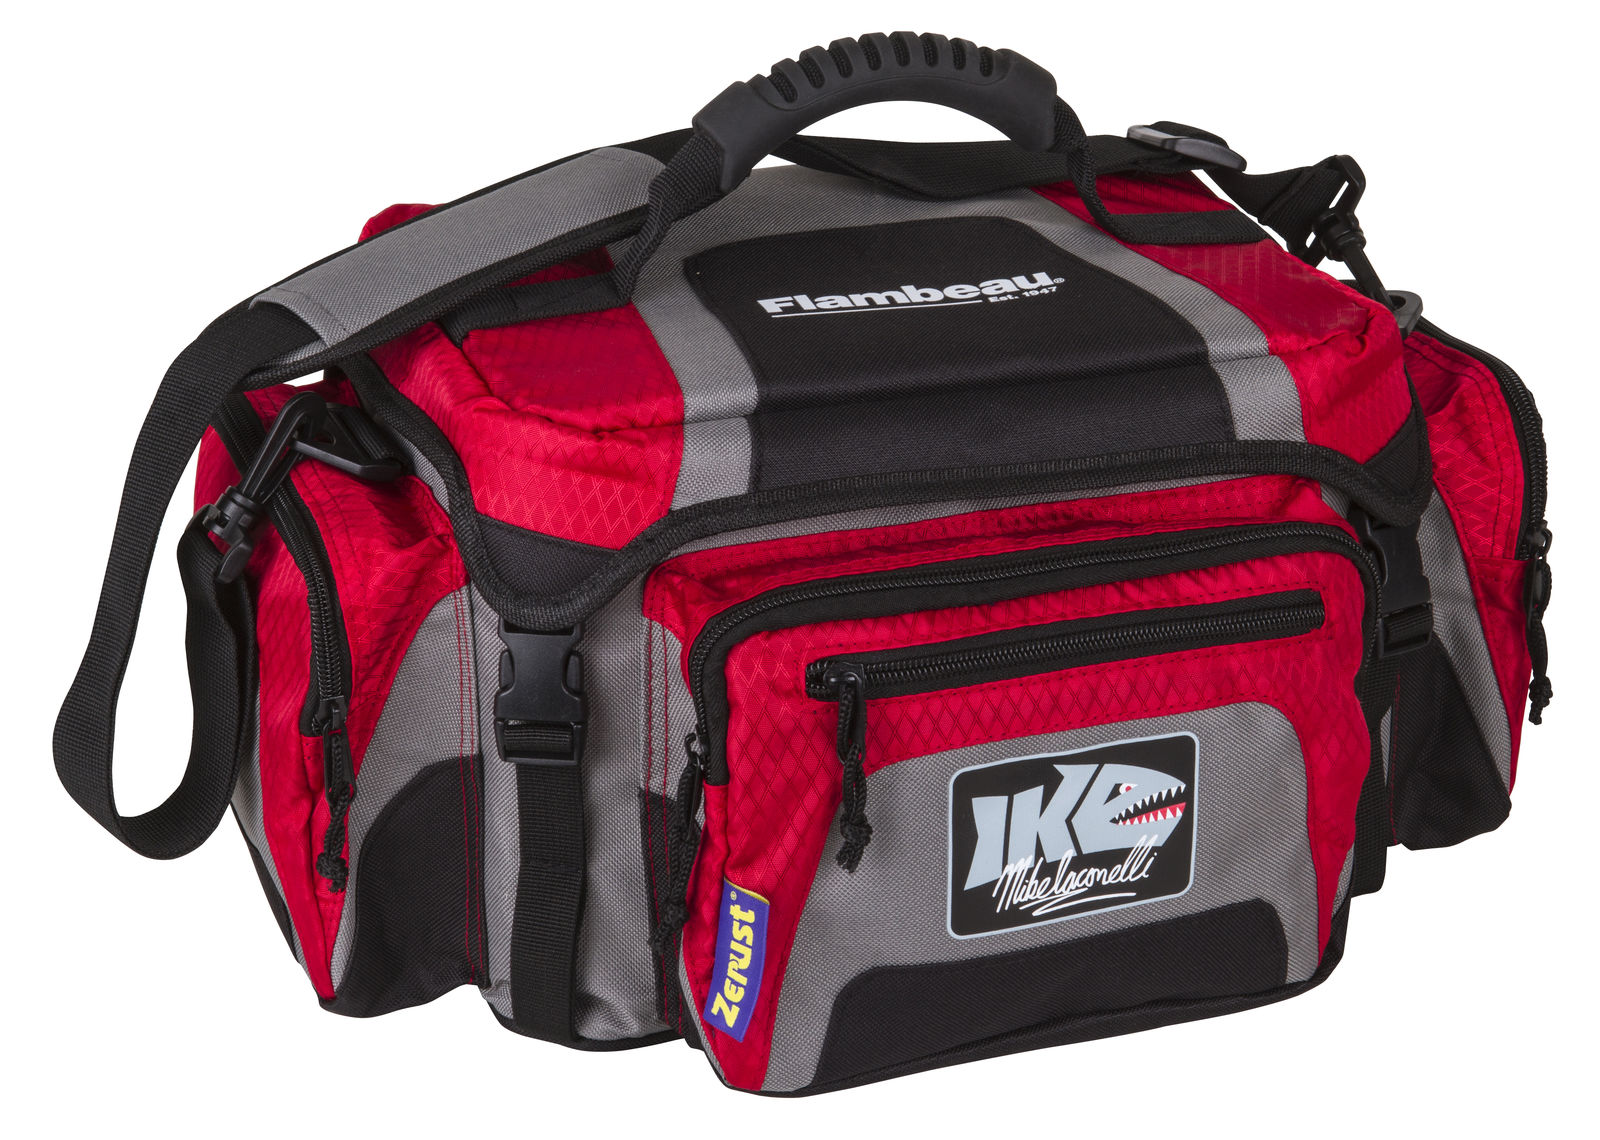 Ike 400 Tackle Bag